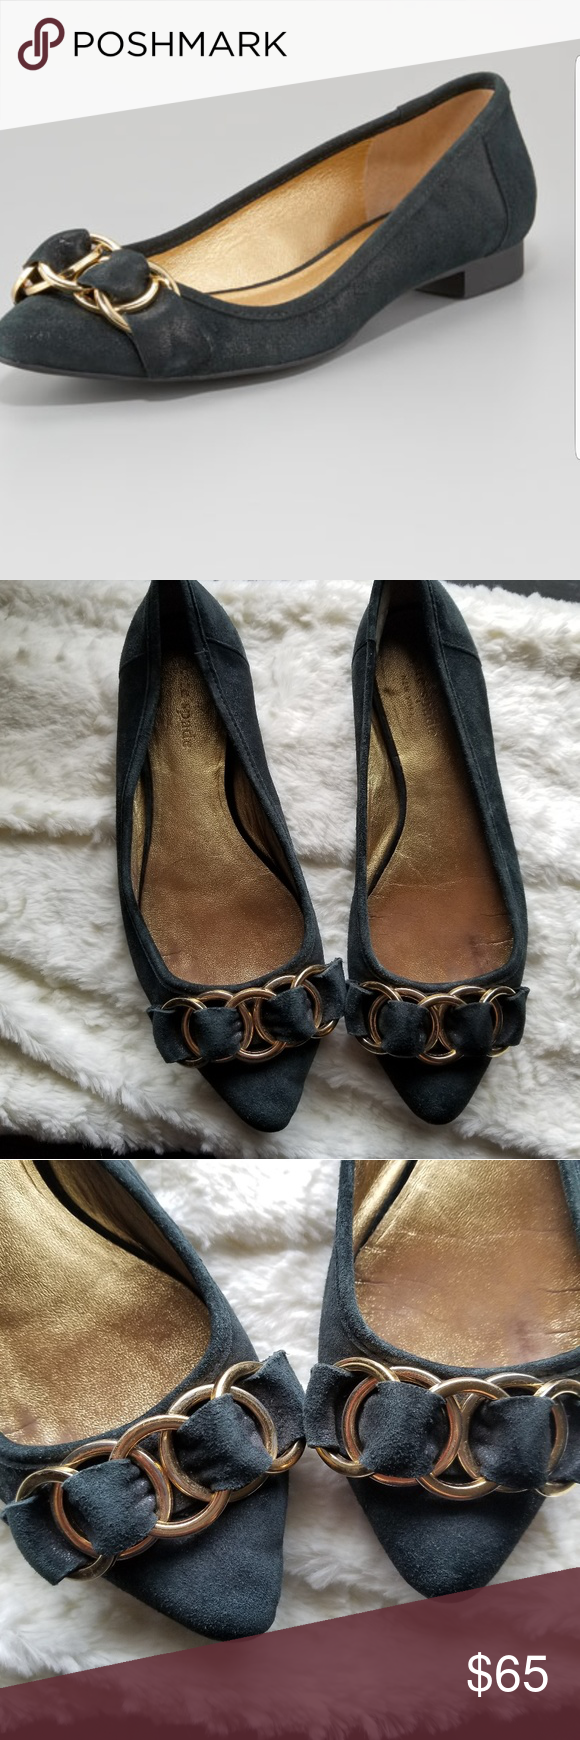 c9a504dc0a8b8c Kate Spade Flats Size 6 Kate Spade Flats Size  Women s 6 Questions please  don